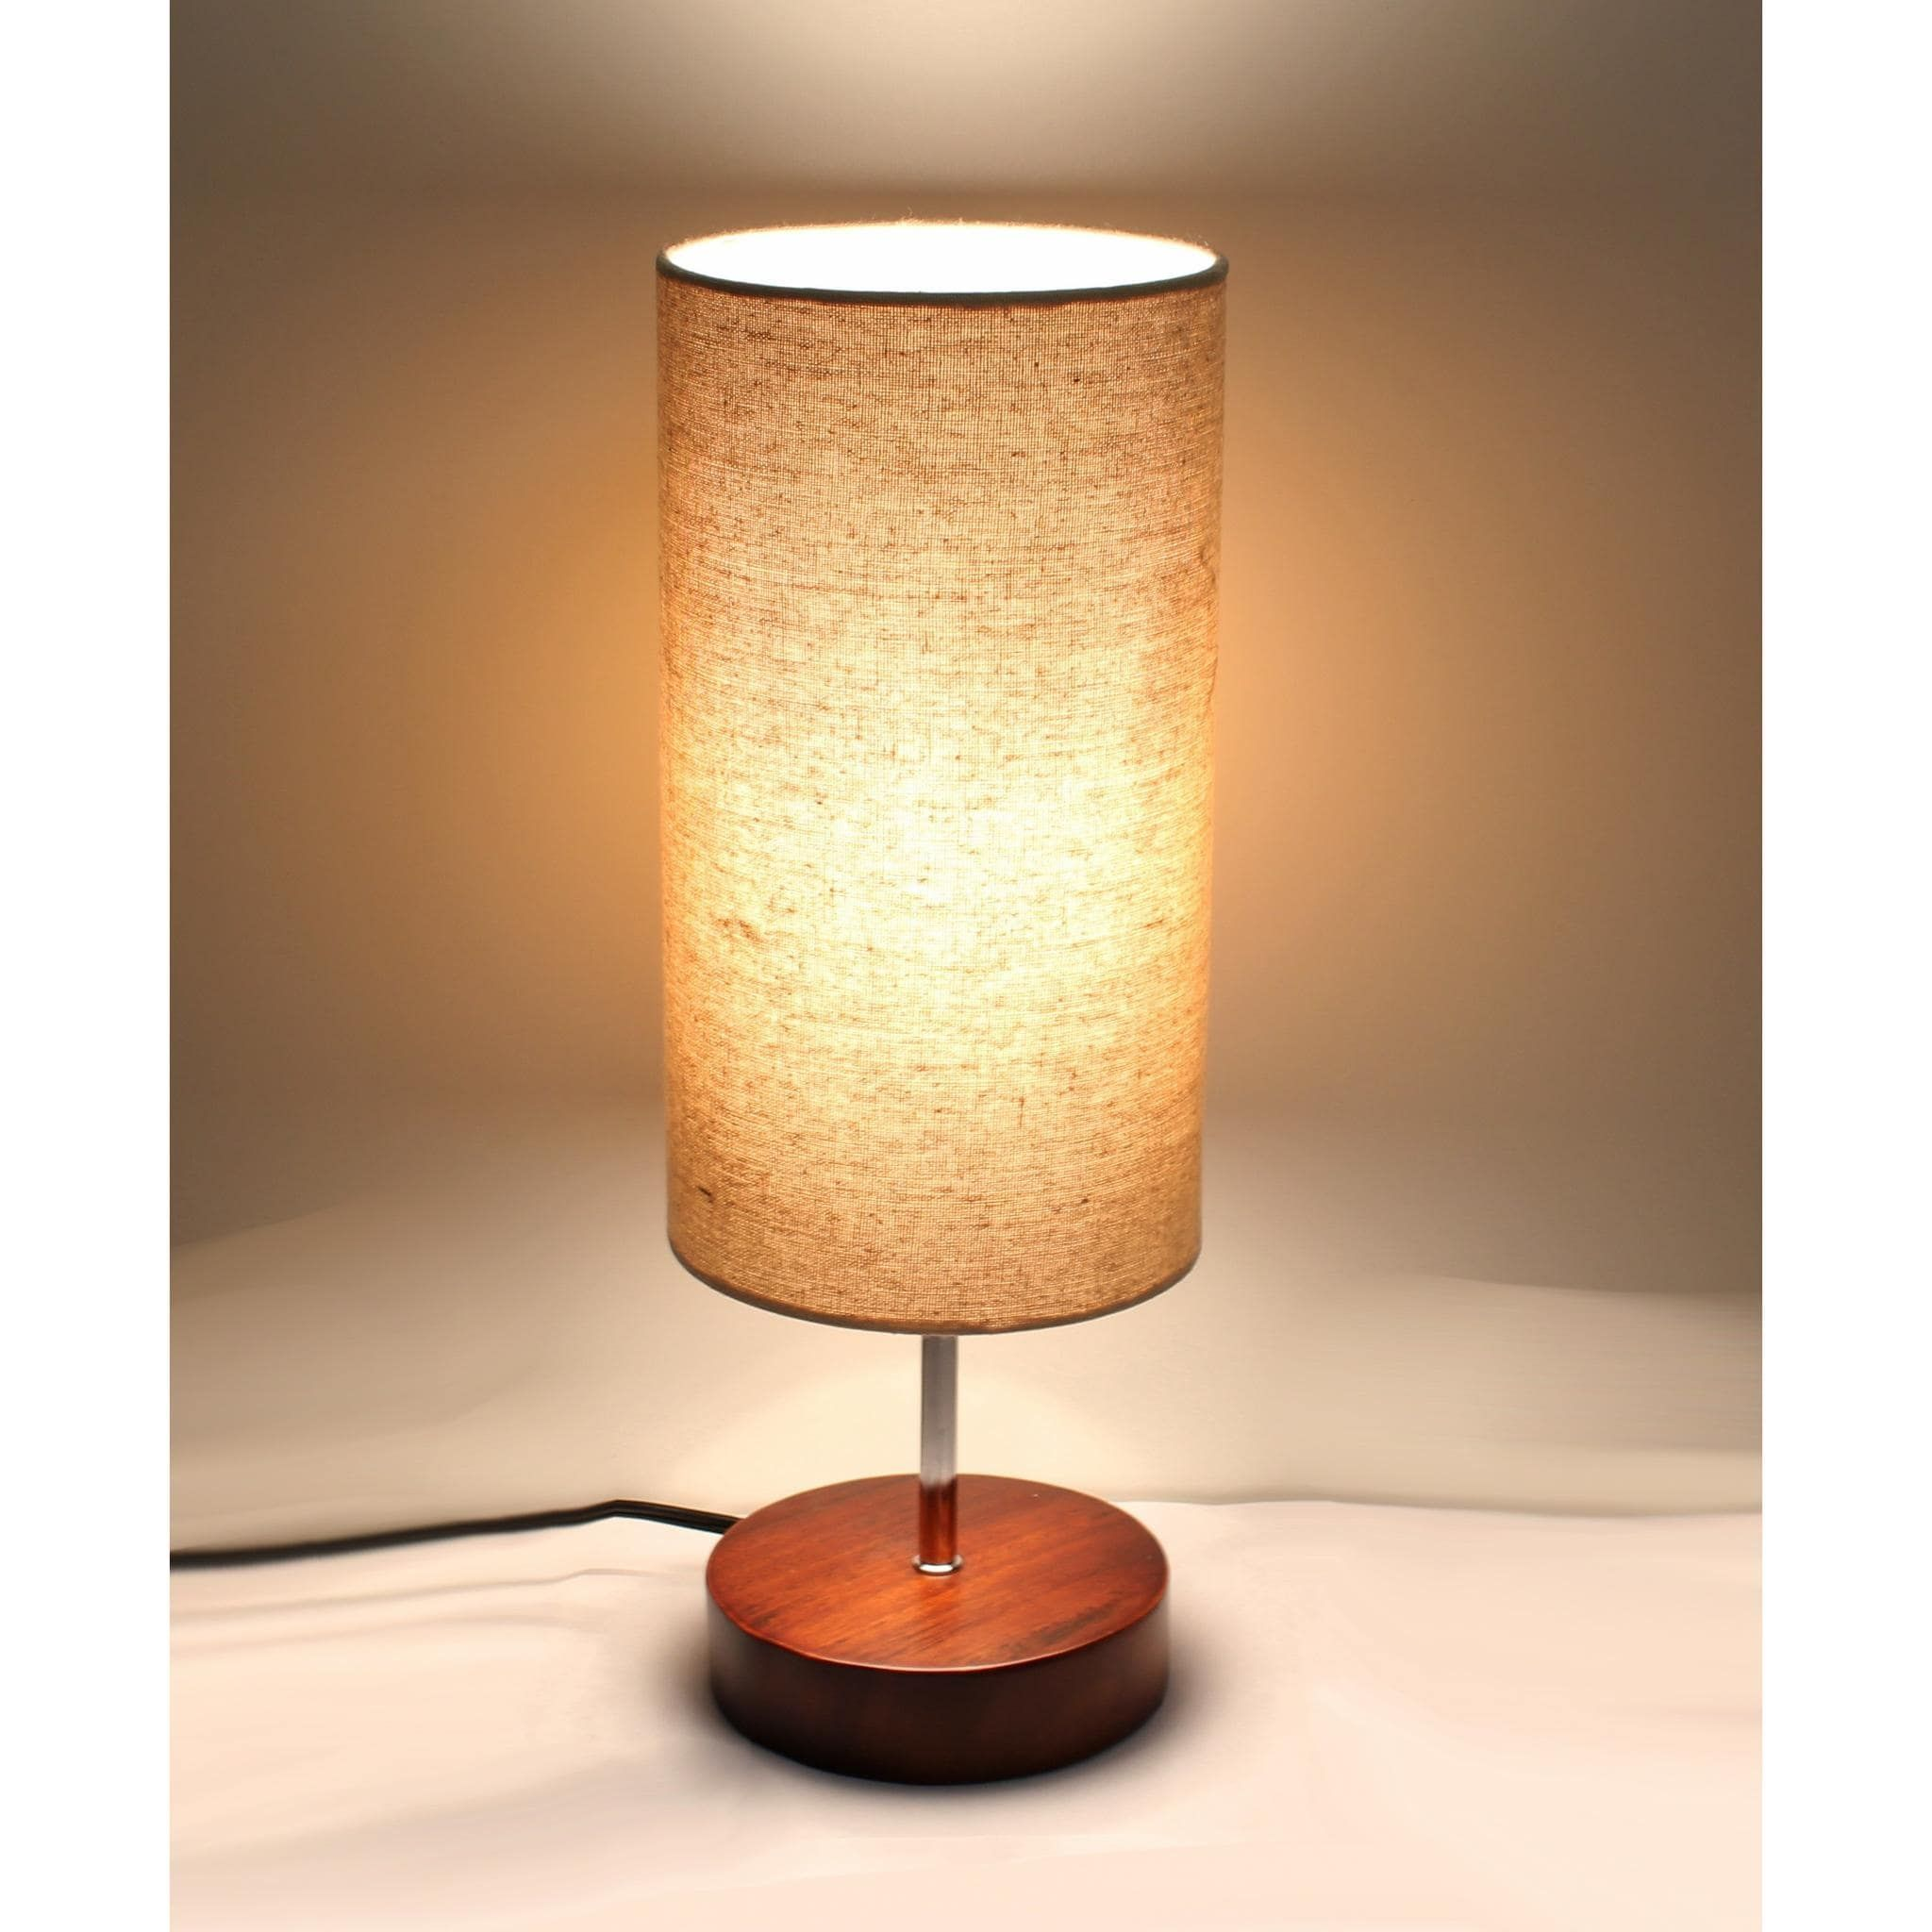 Kanstar 17 Minimalist Round Sandalwood Base Bedside Desk Living Room Lamp  With Fabric Shade, Brown